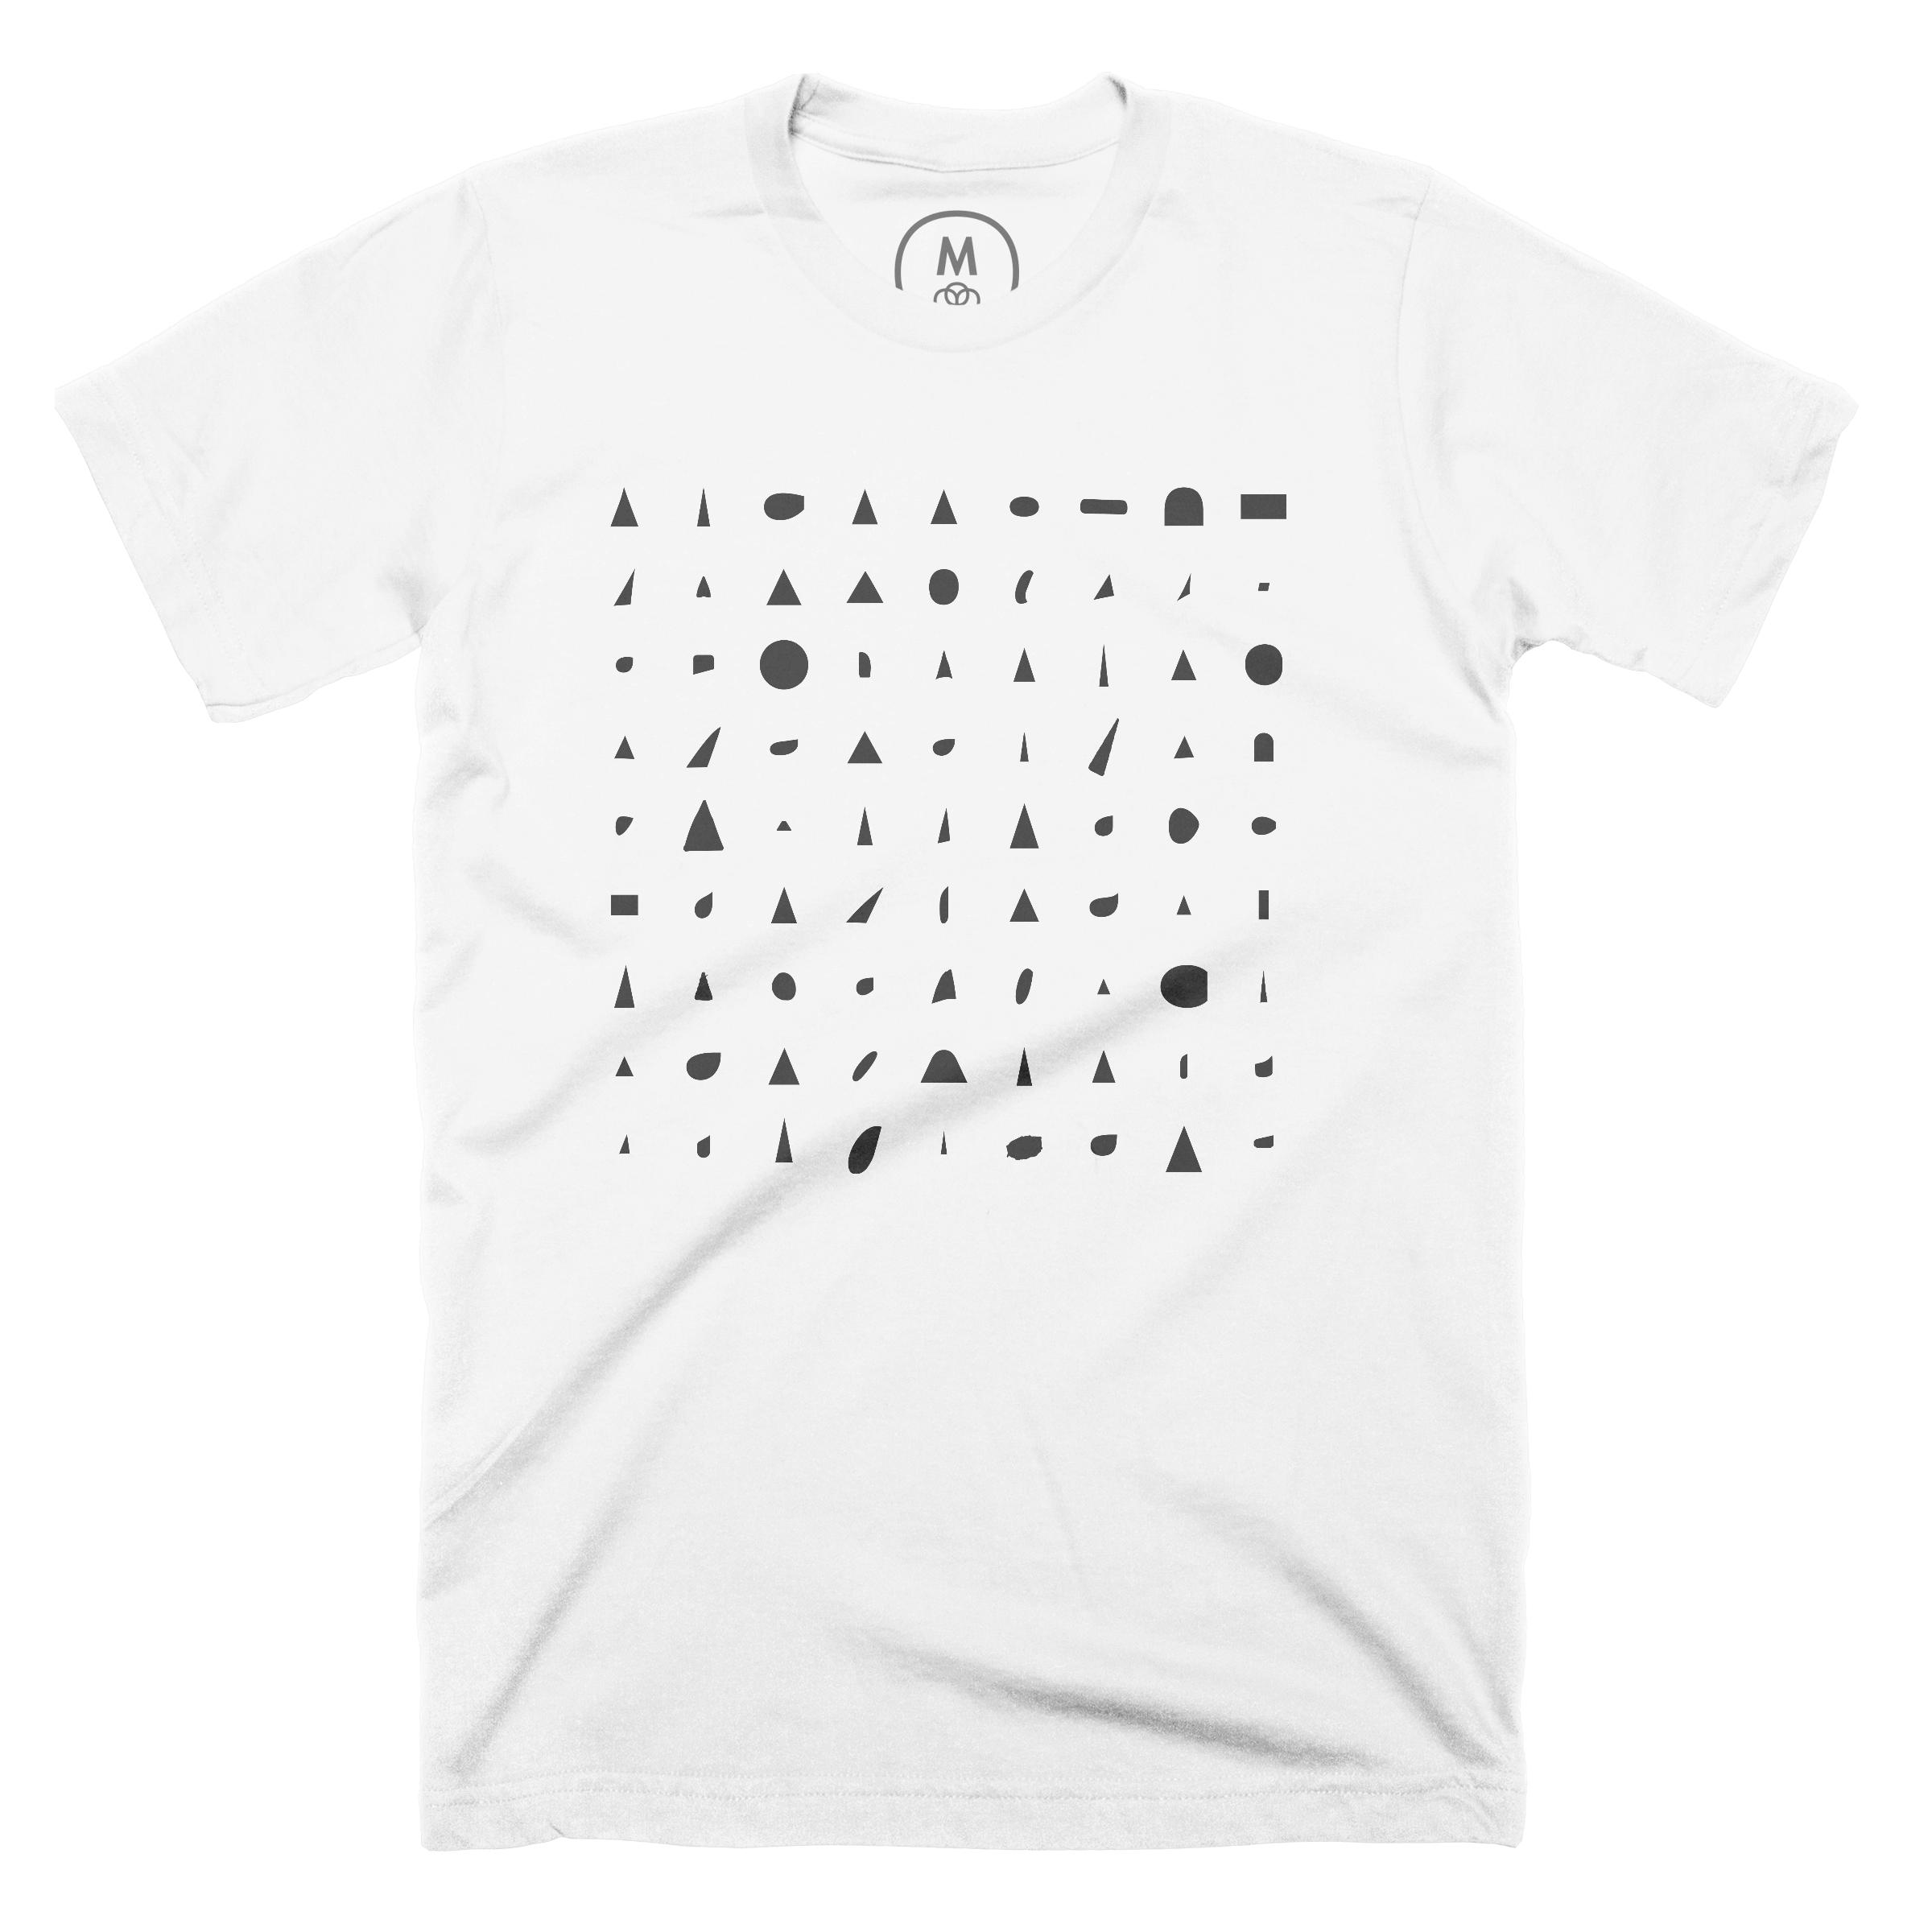 81 A-holes White (Men's)